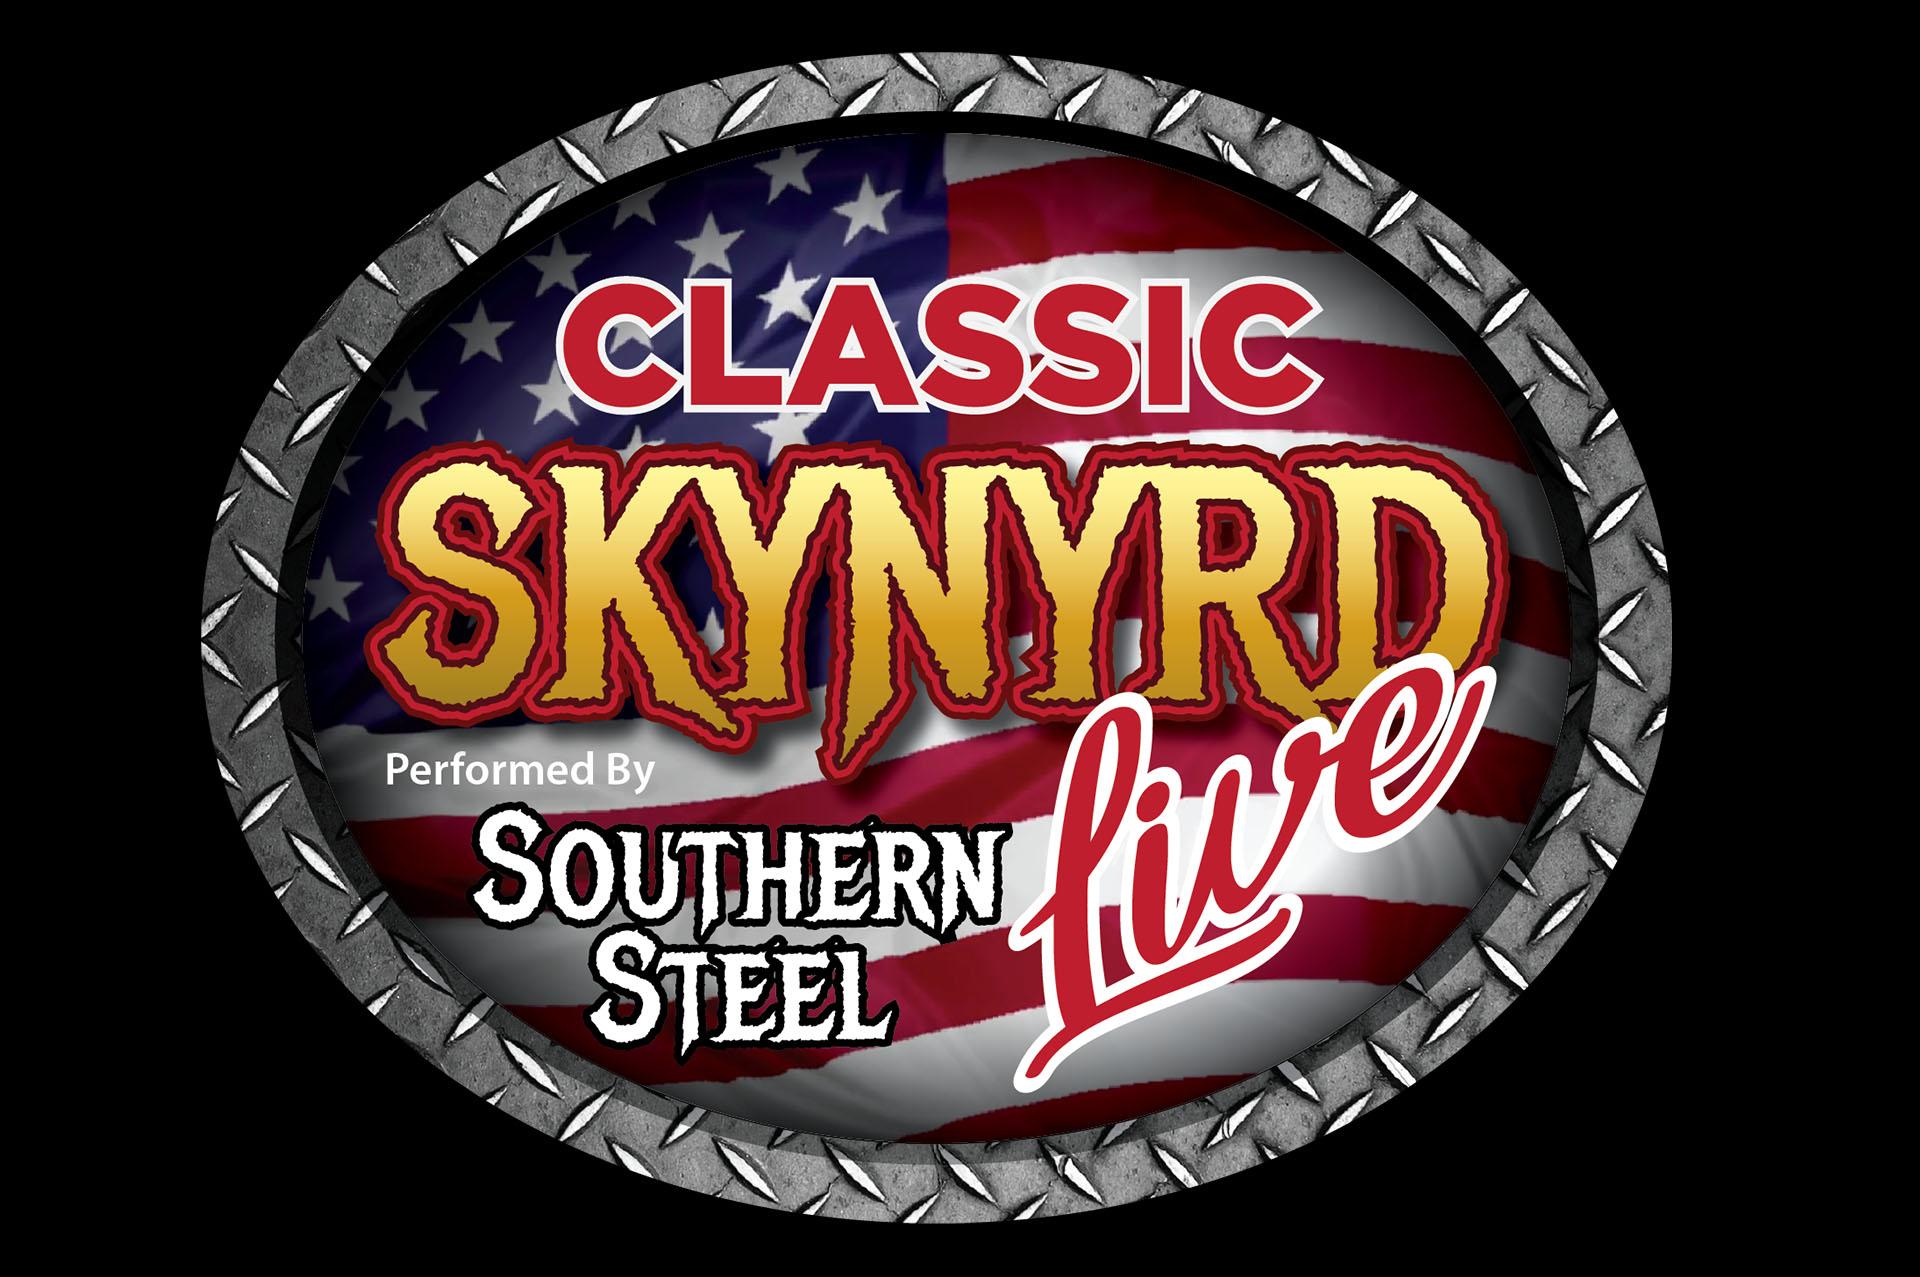 classic-skynard-homepage-01